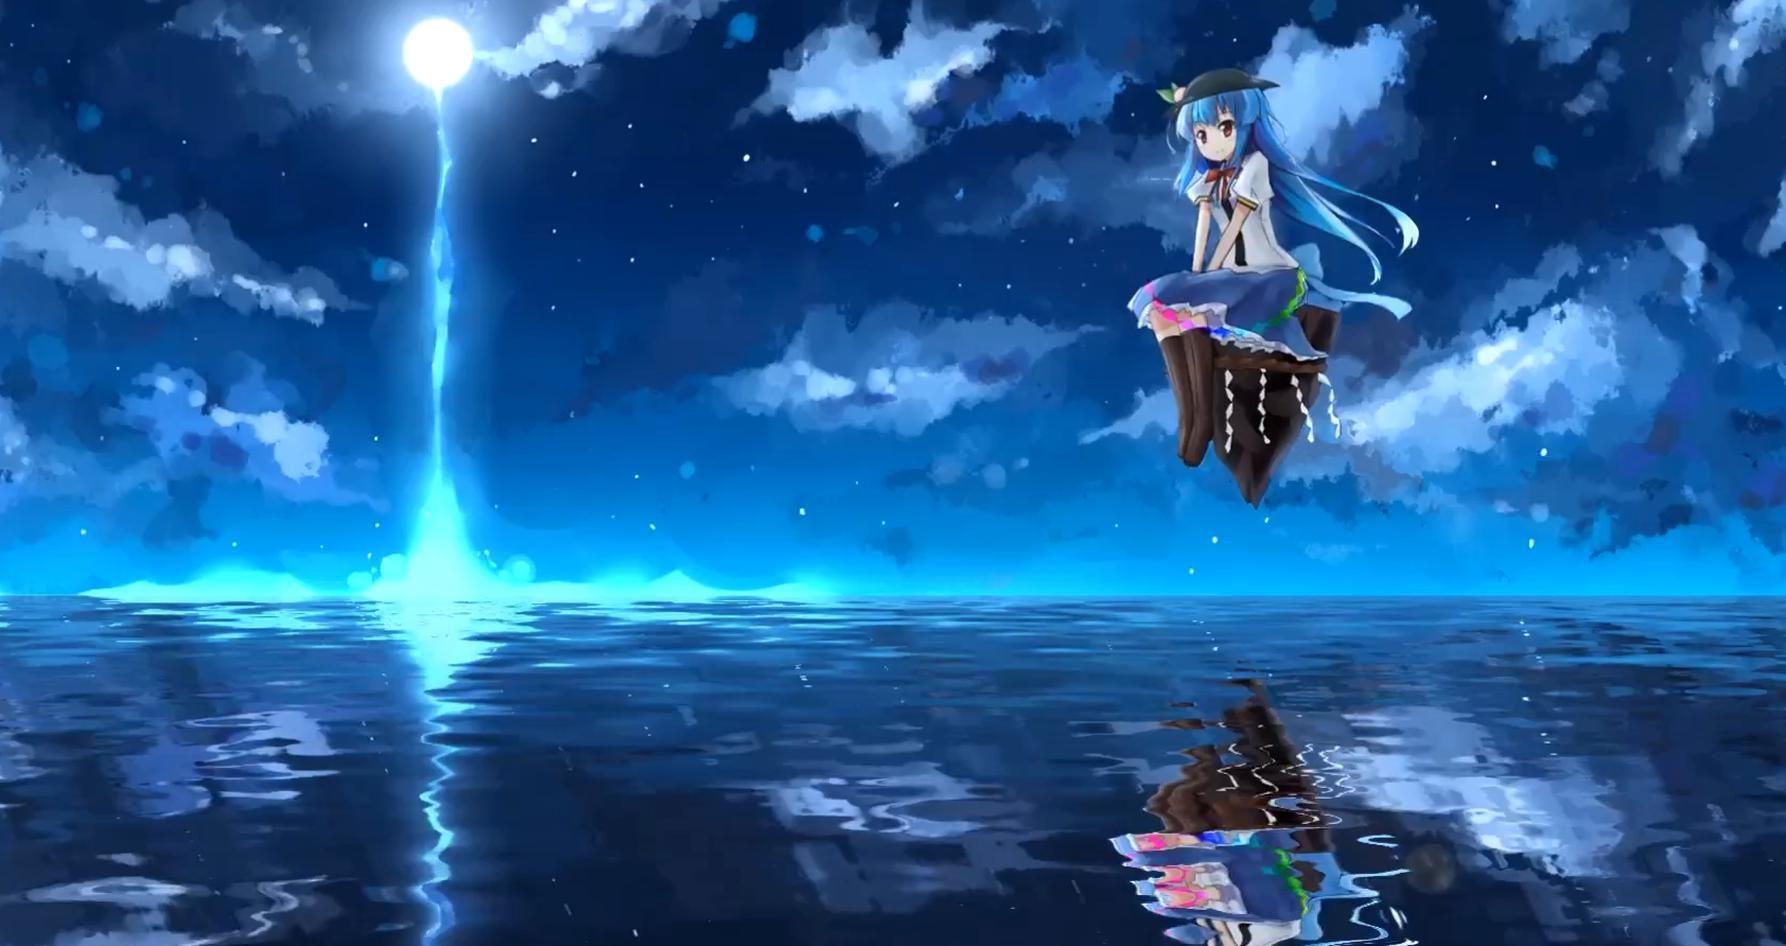 Free Anime Wallpaper Engine ayam